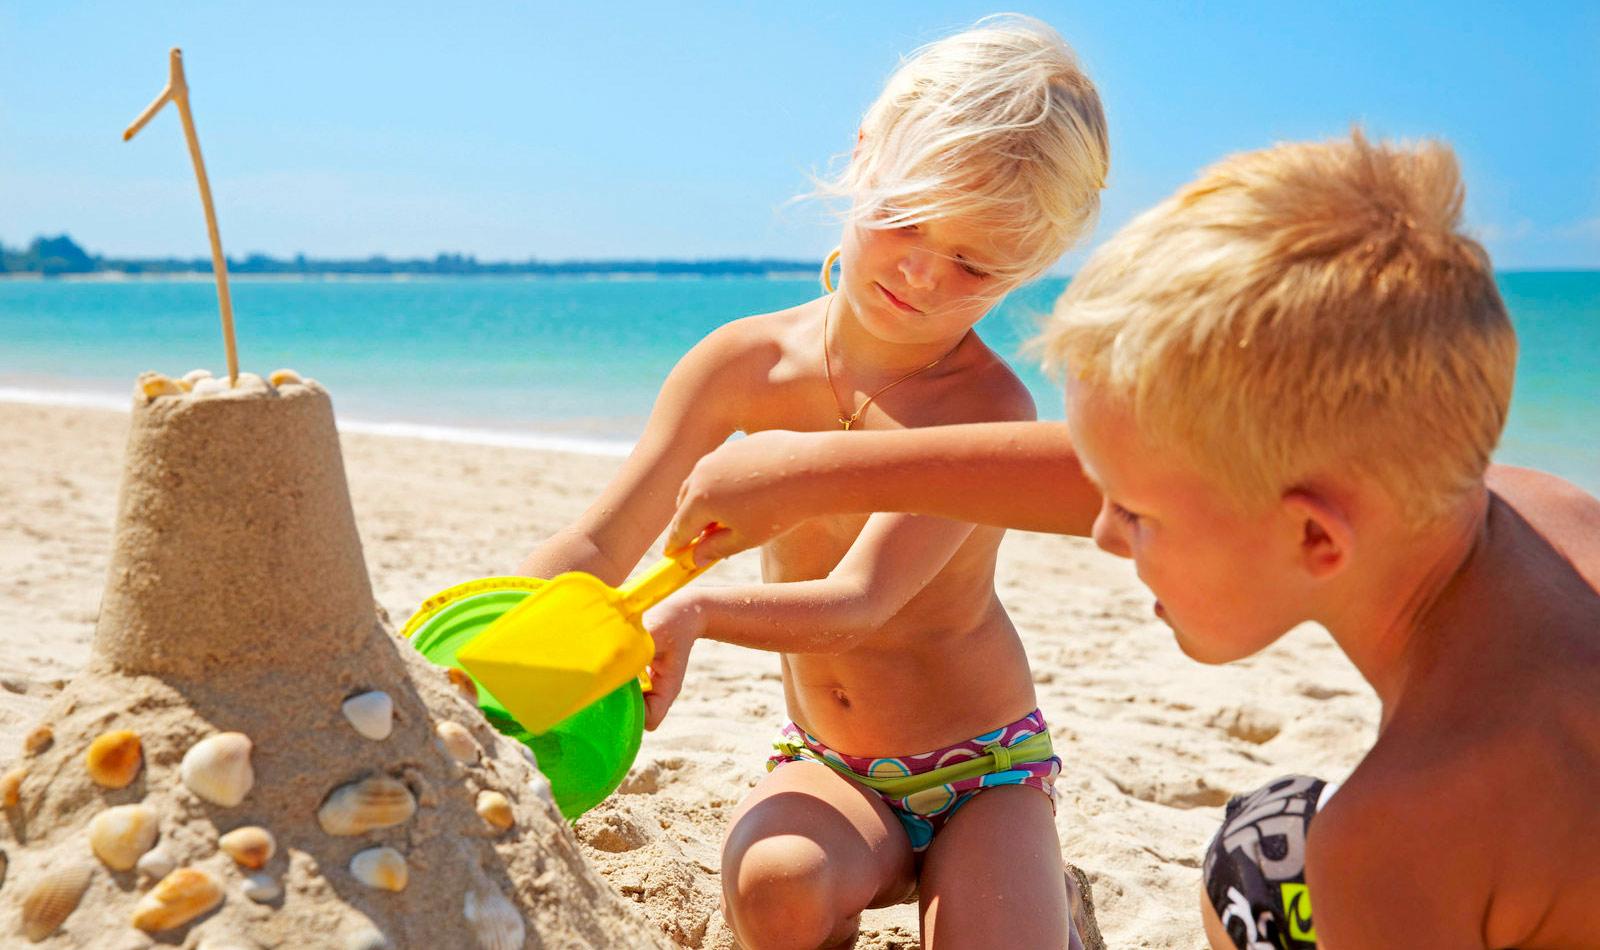 Italien TUI Family Life Janna e Sole bei Cluburlaub.de